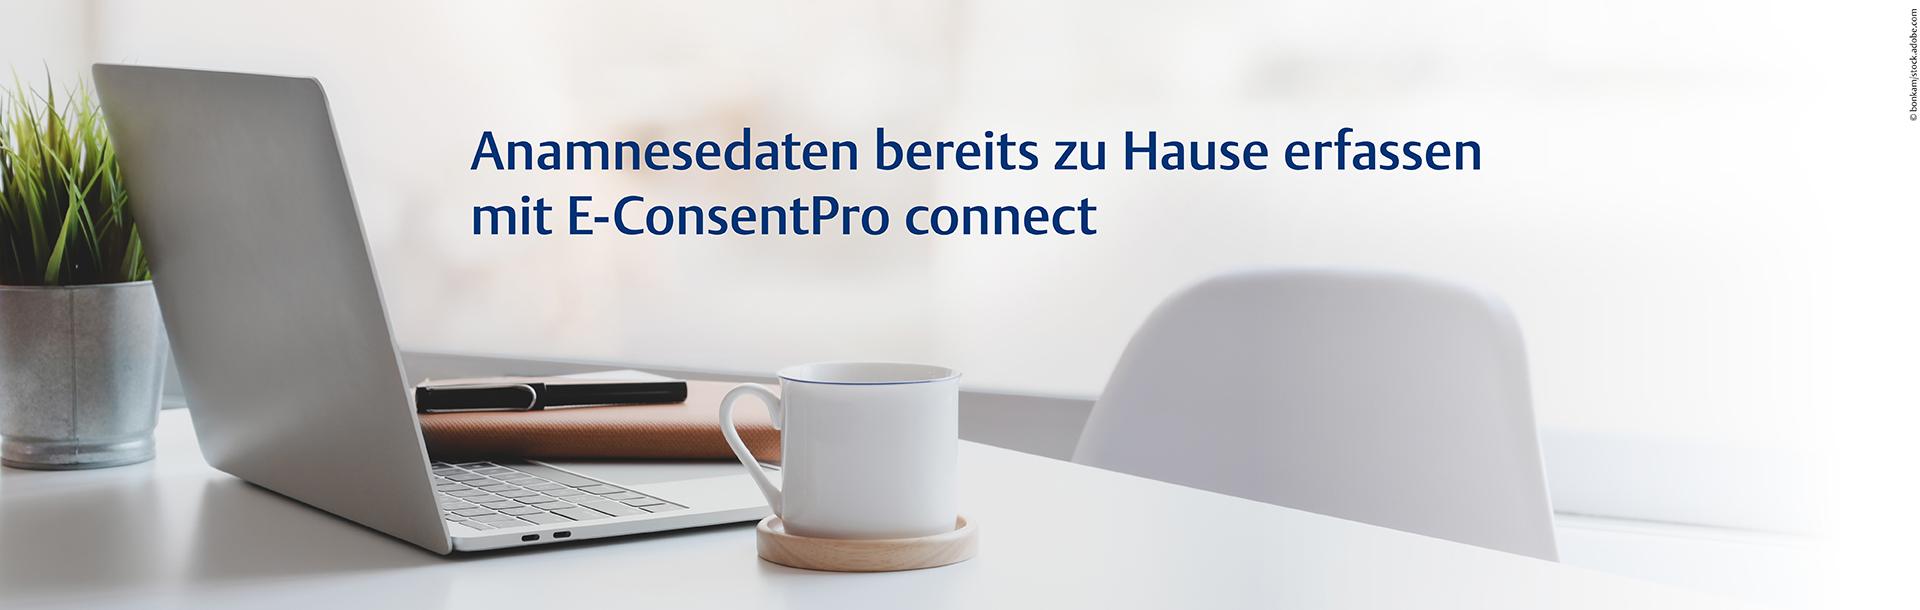 Slider E-ConsentPro connect